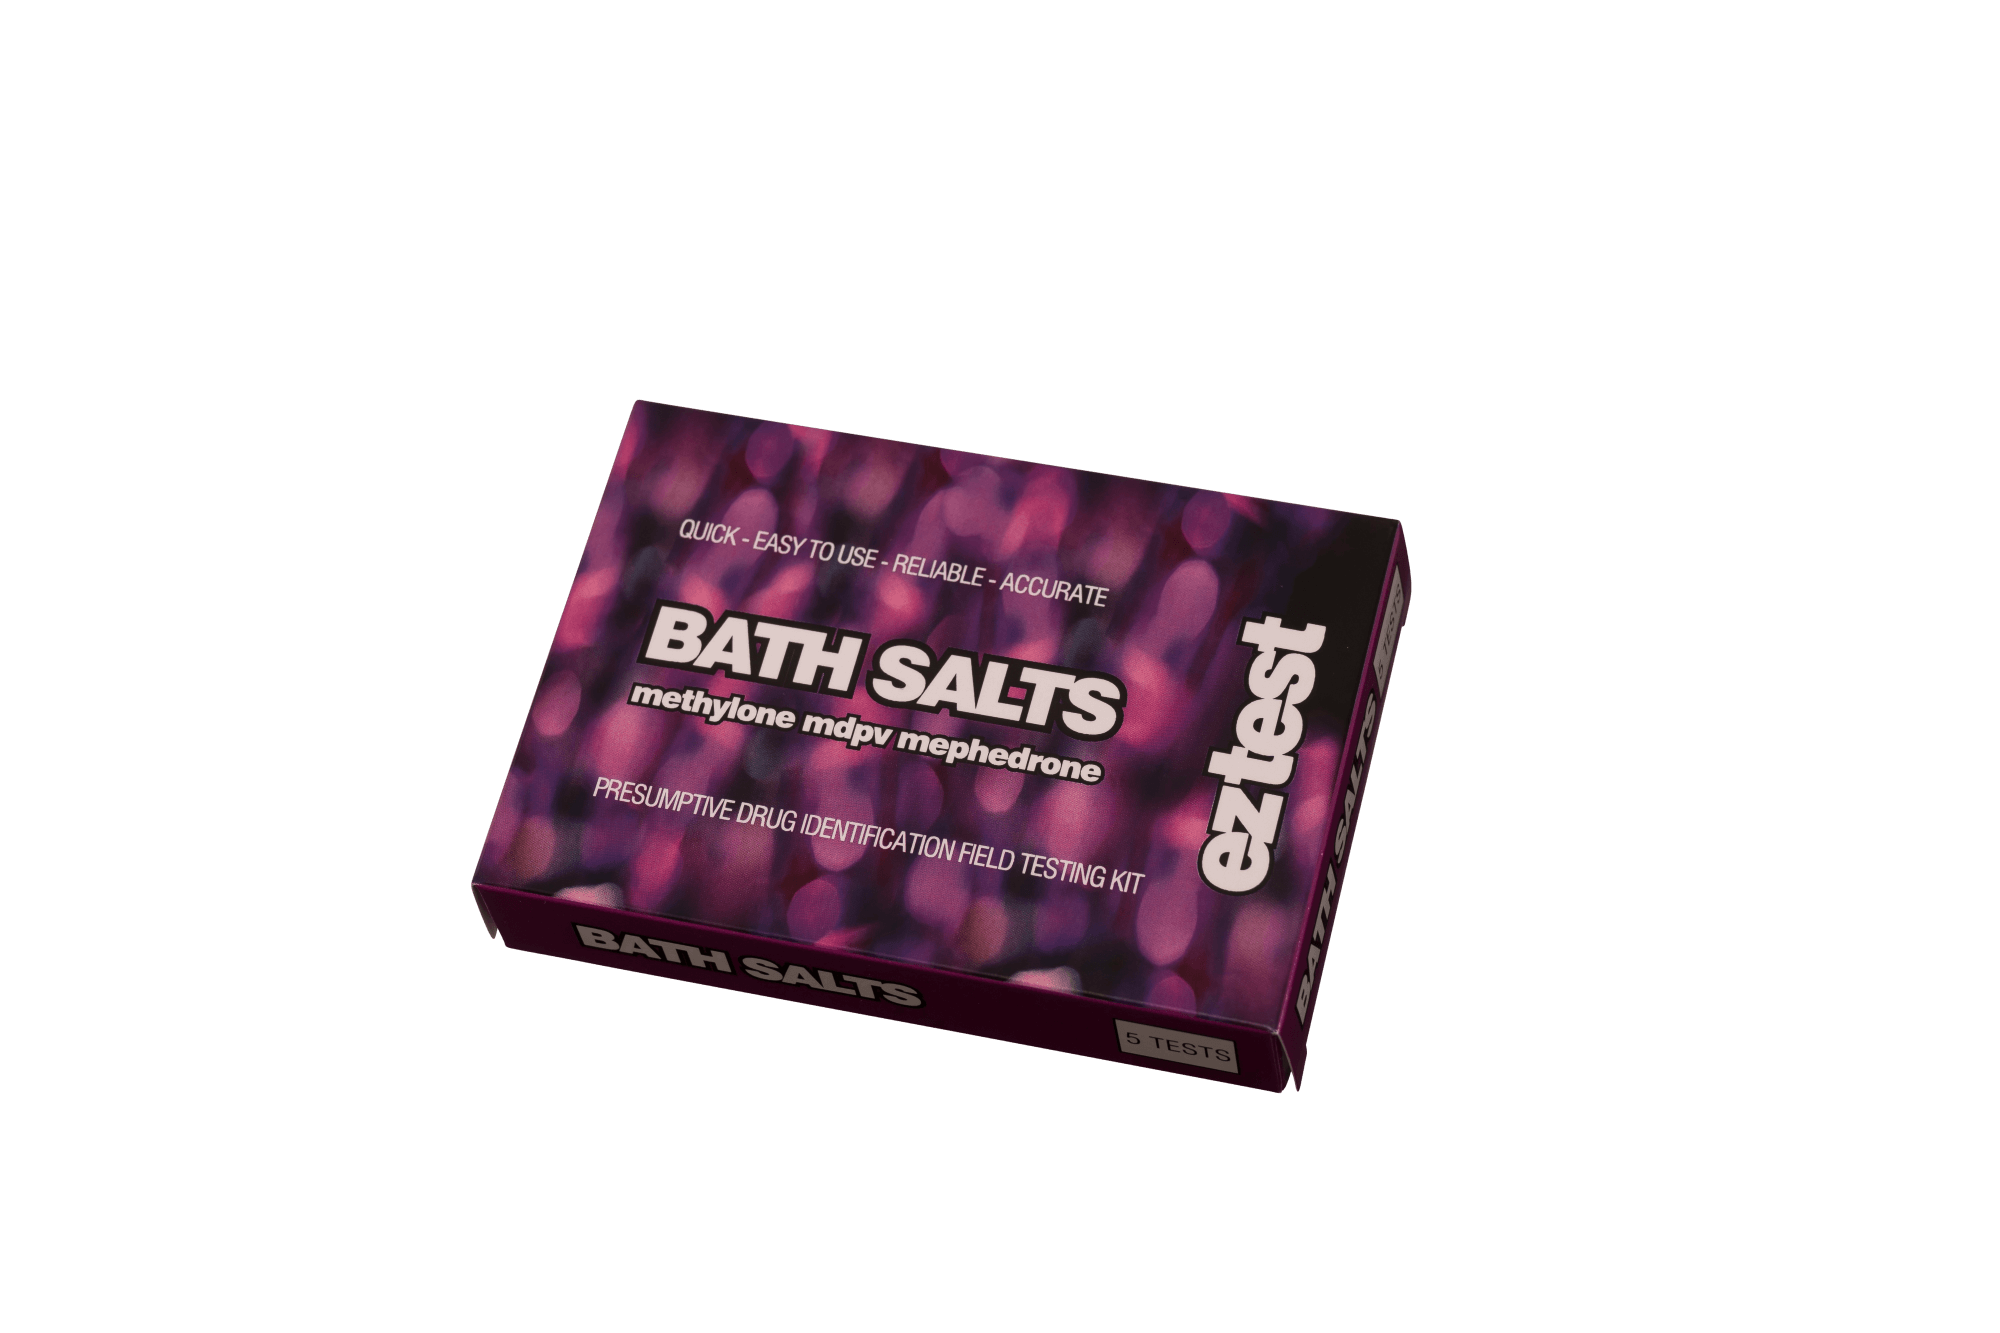 Bath Salts 5 Use Drug Testing Kit